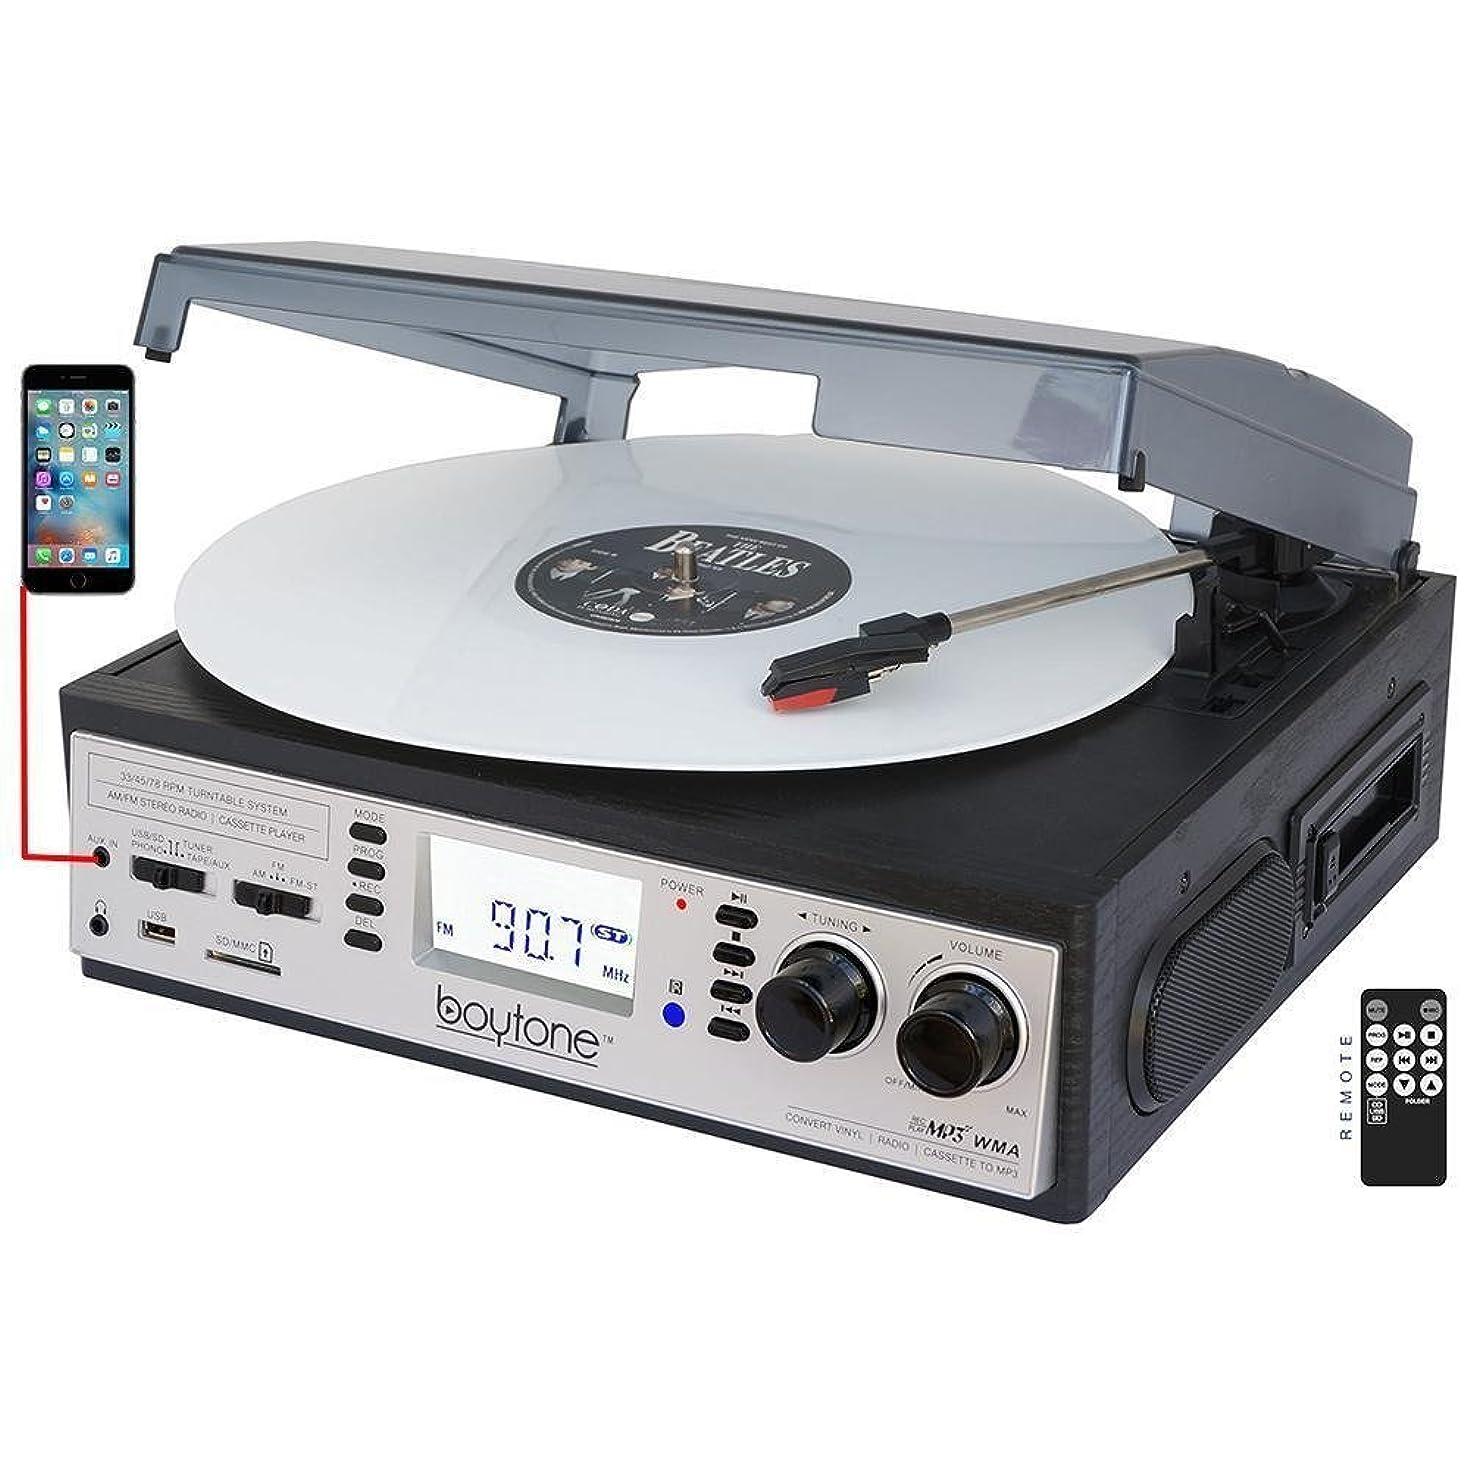 Boytone BT-19DJS-C 3-speed Turntable, 2 Built in Speakers Large Digital Display AM/FM, Cassette, USB/SD/AUX/MP3, Recorder & WMA Playback /Recorder & Headphone Jack + Remote Con (Renewed)